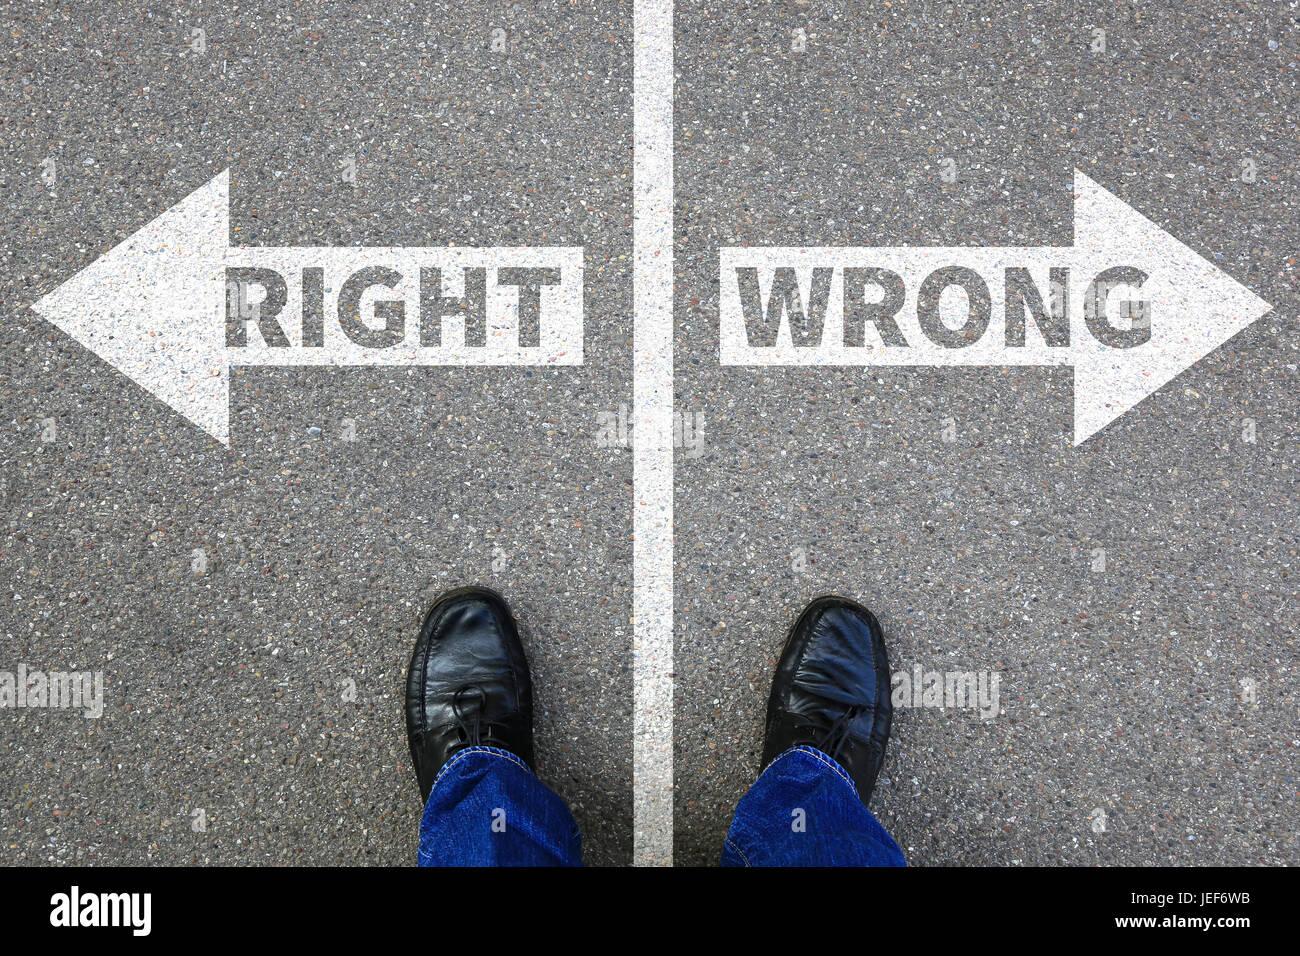 Derecho negocio equivocado concepto empresario metas éxito solución decisión decidir elección Imagen De Stock